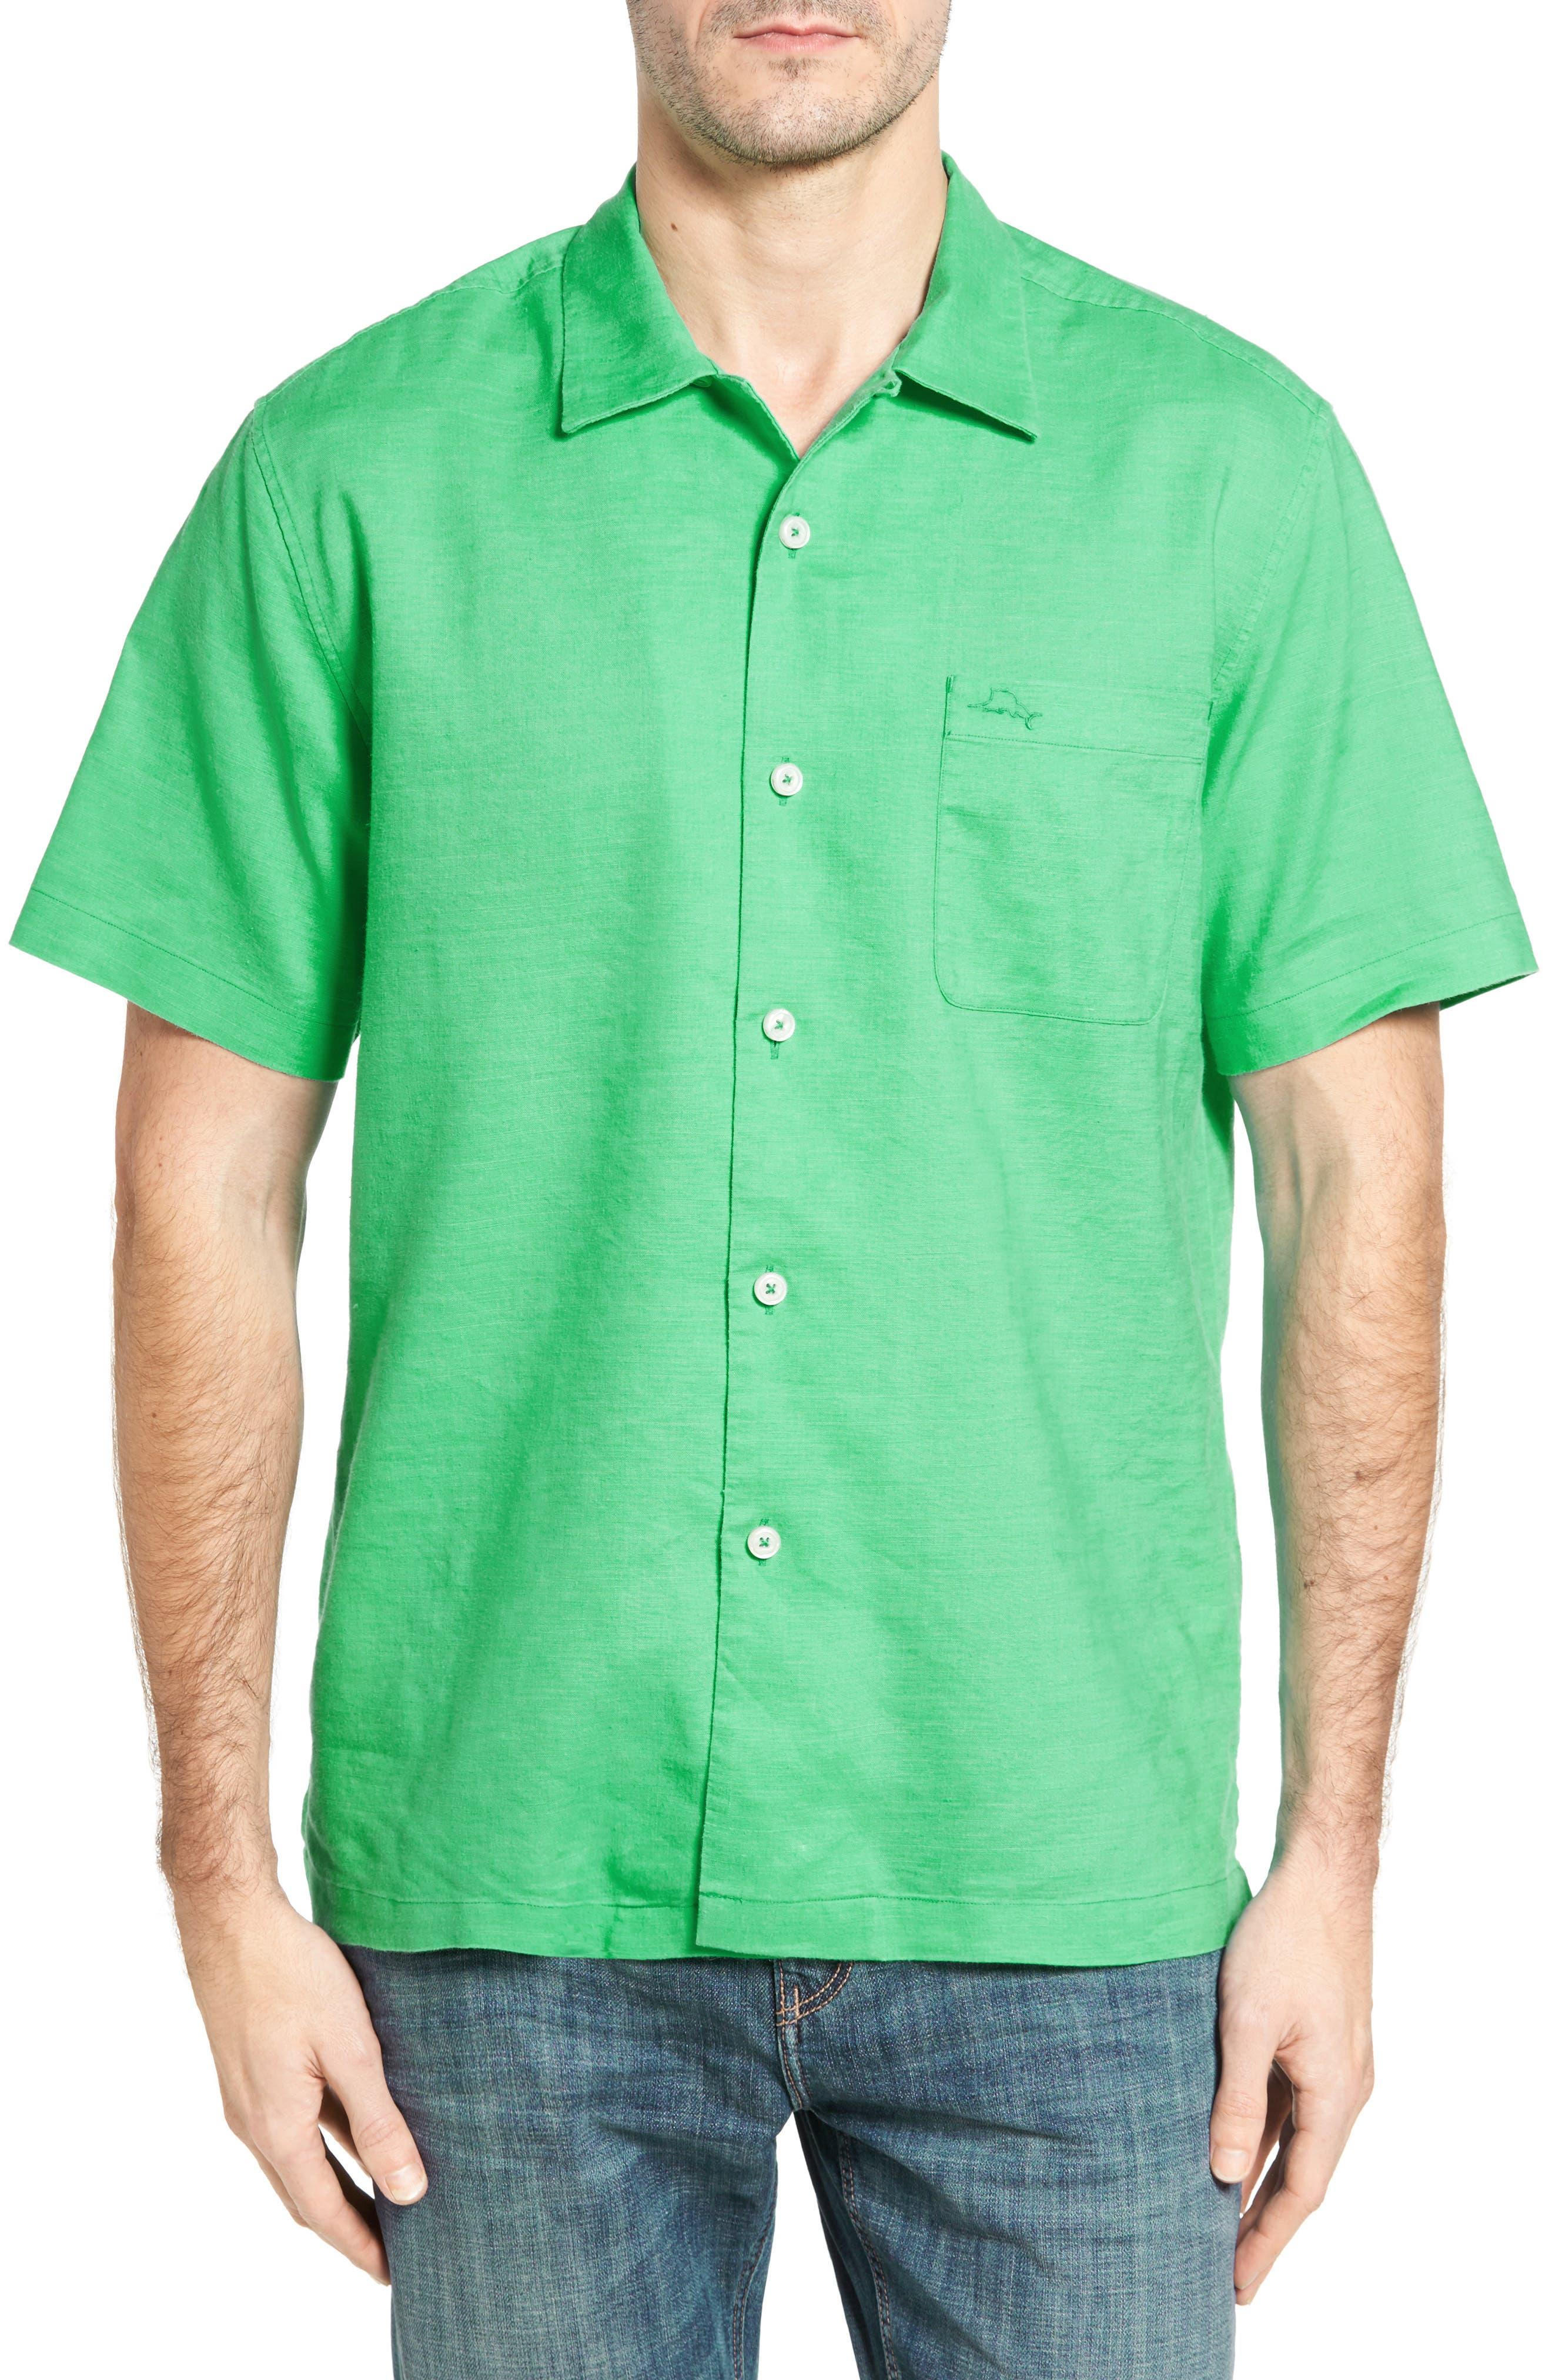 Tommy Bahama Monaco Tides Linen Blend Camp Shirt (Big & Tall)